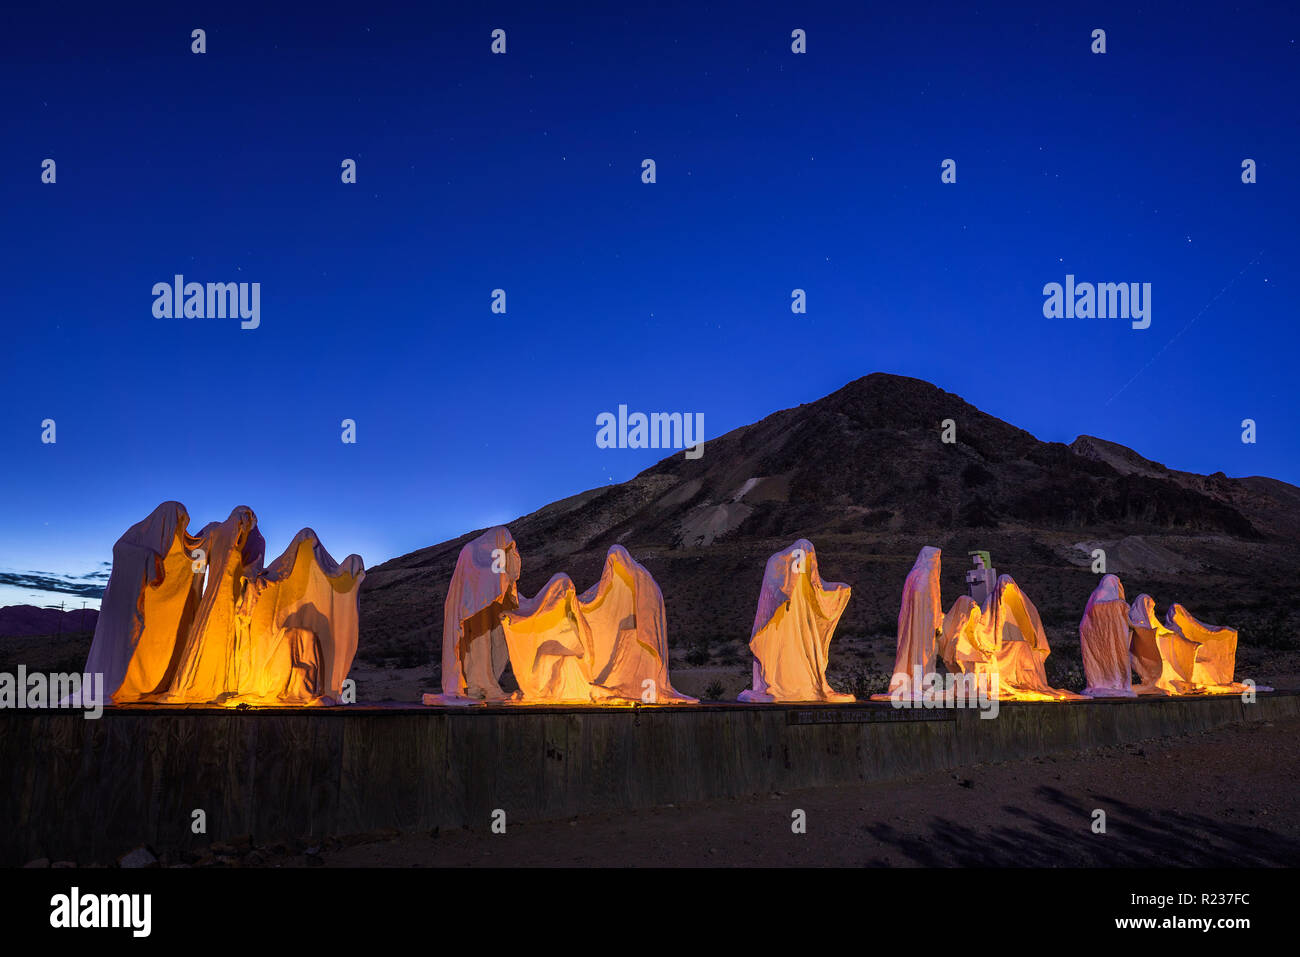 Creepy ghost sculpture installation in Rhyolite, Nevada - Stock Image